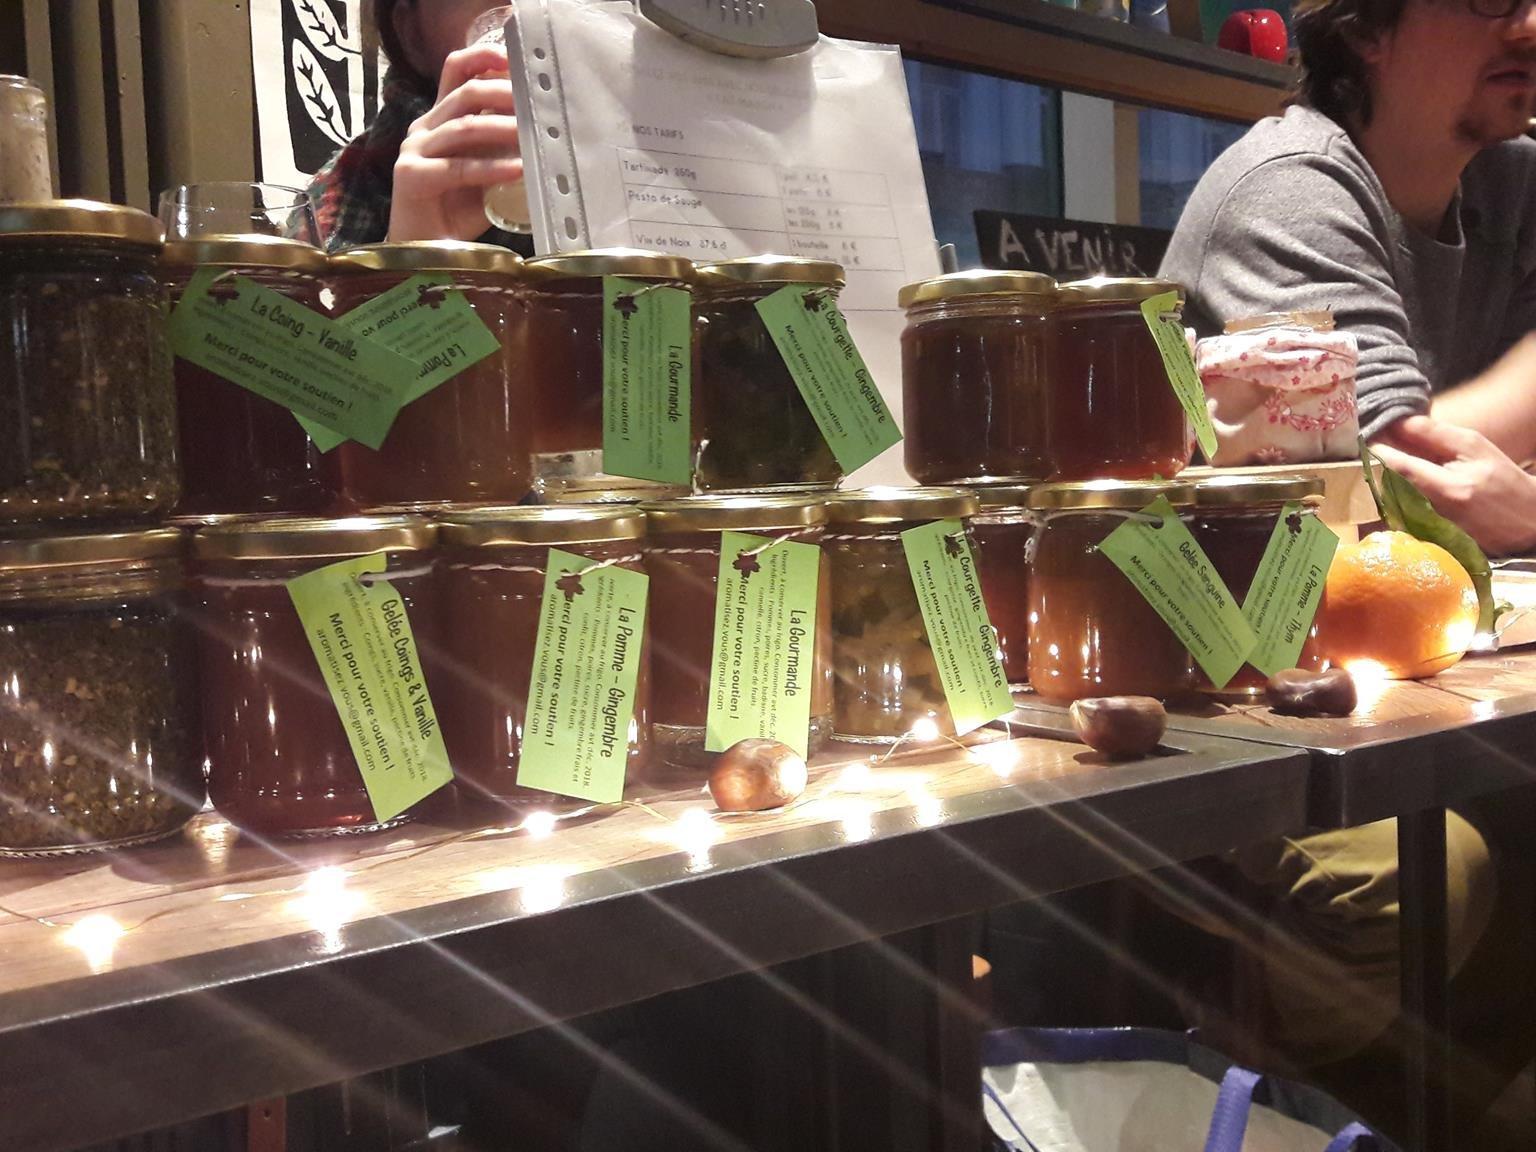 produits confitures tartinades aromatisez vous aromatisez-vous